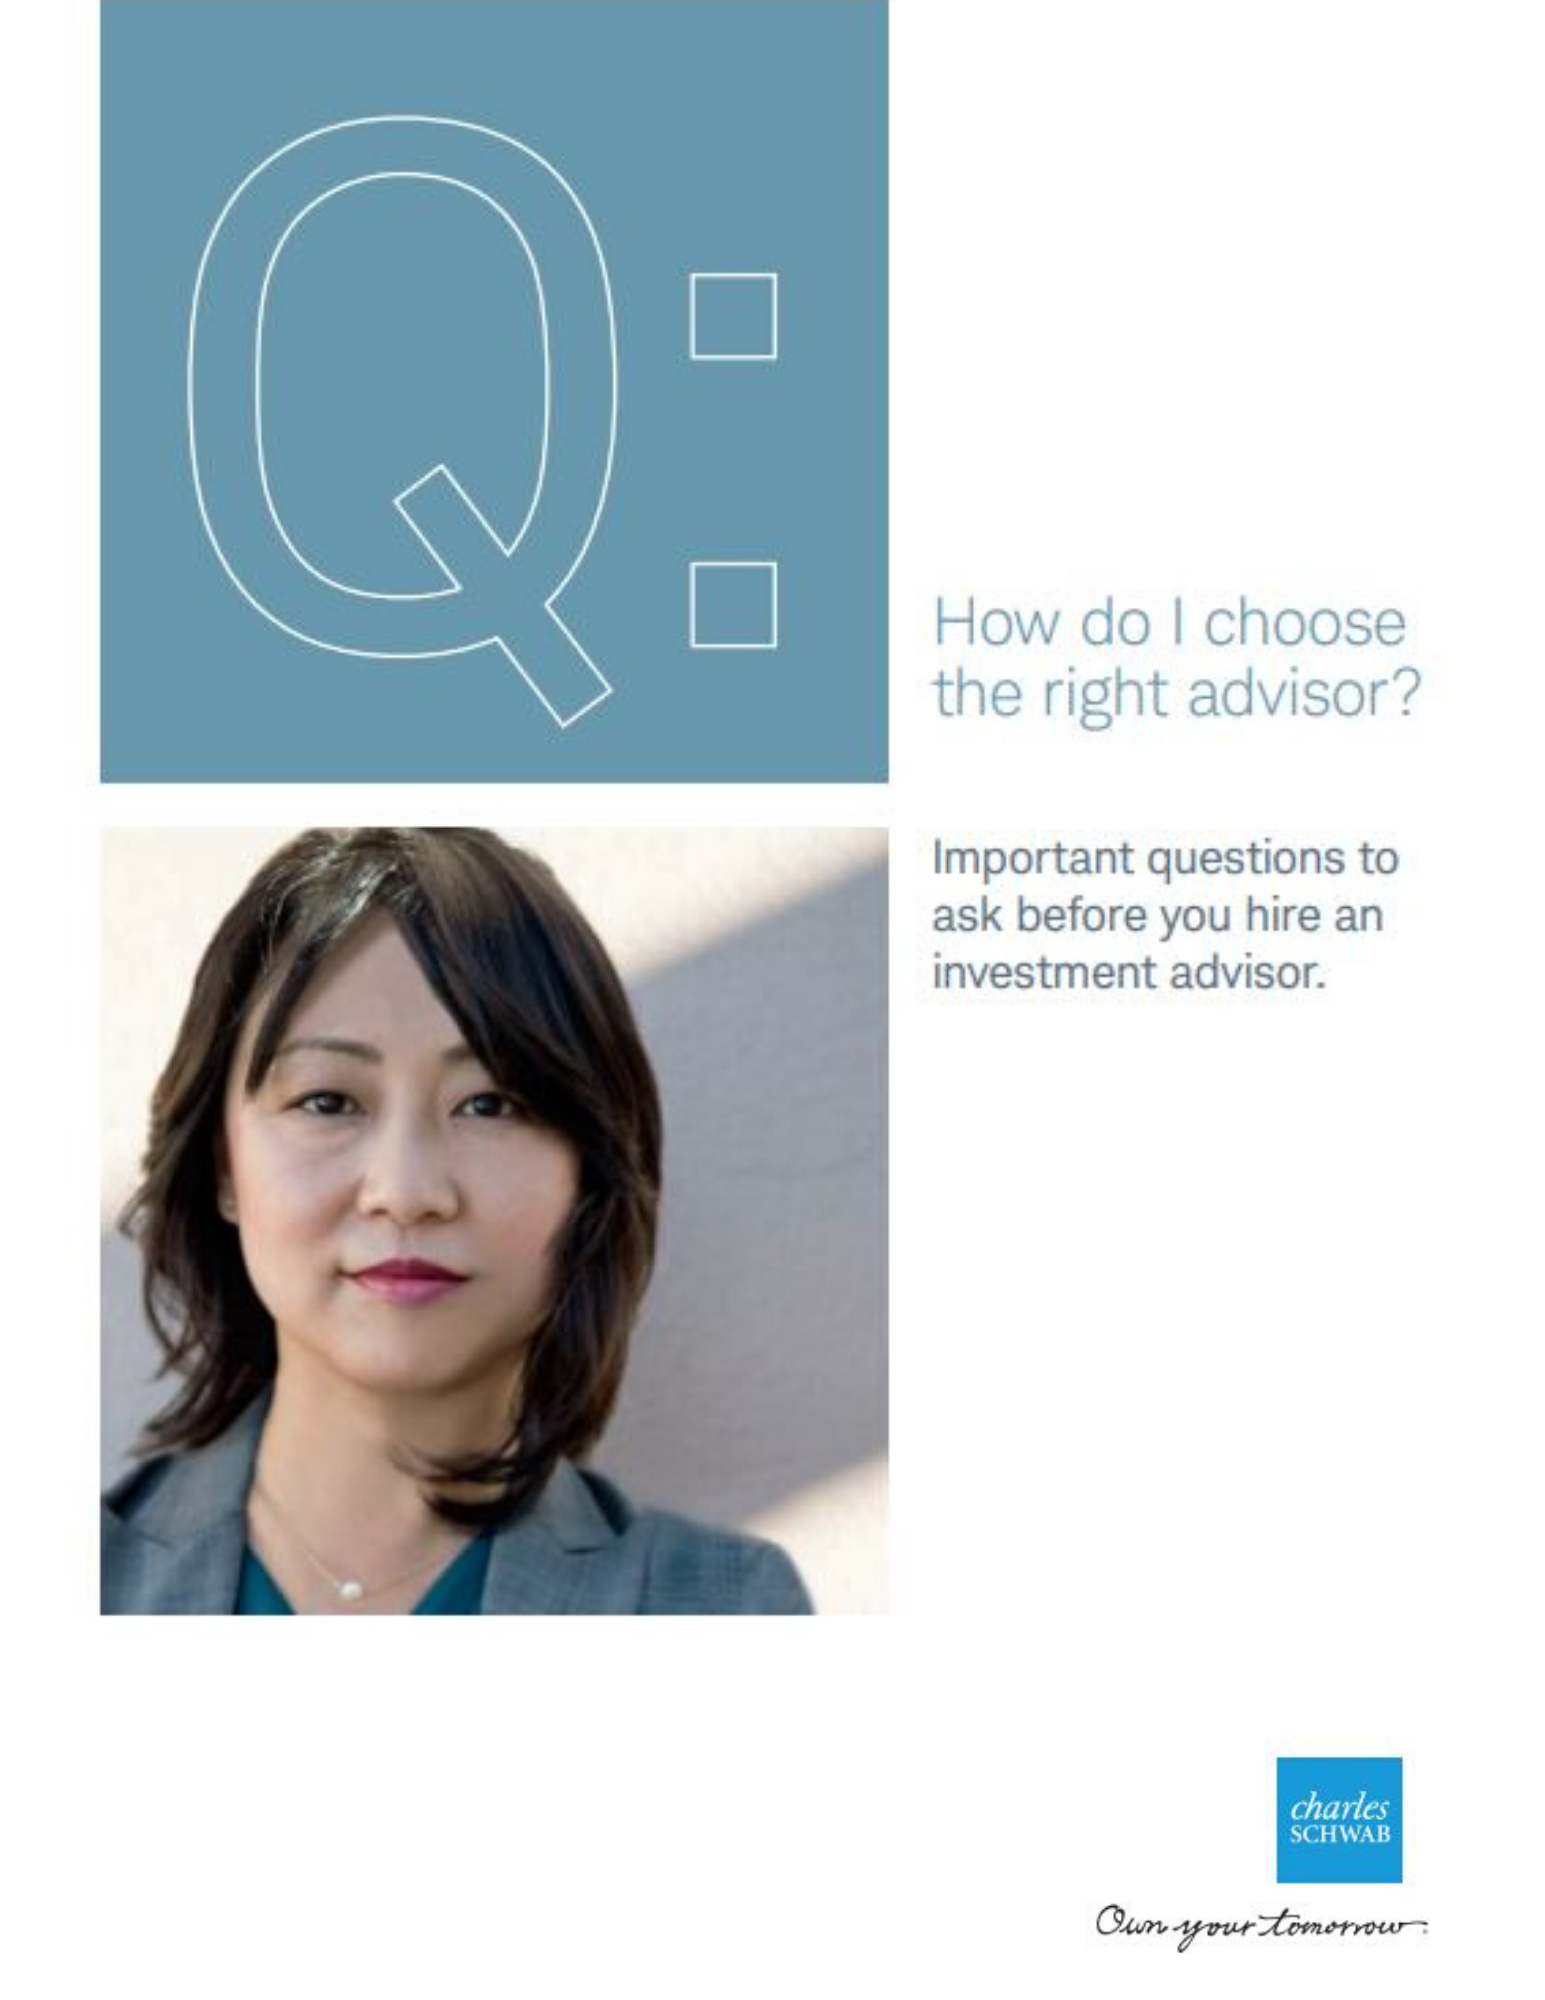 Choosing the right advisor